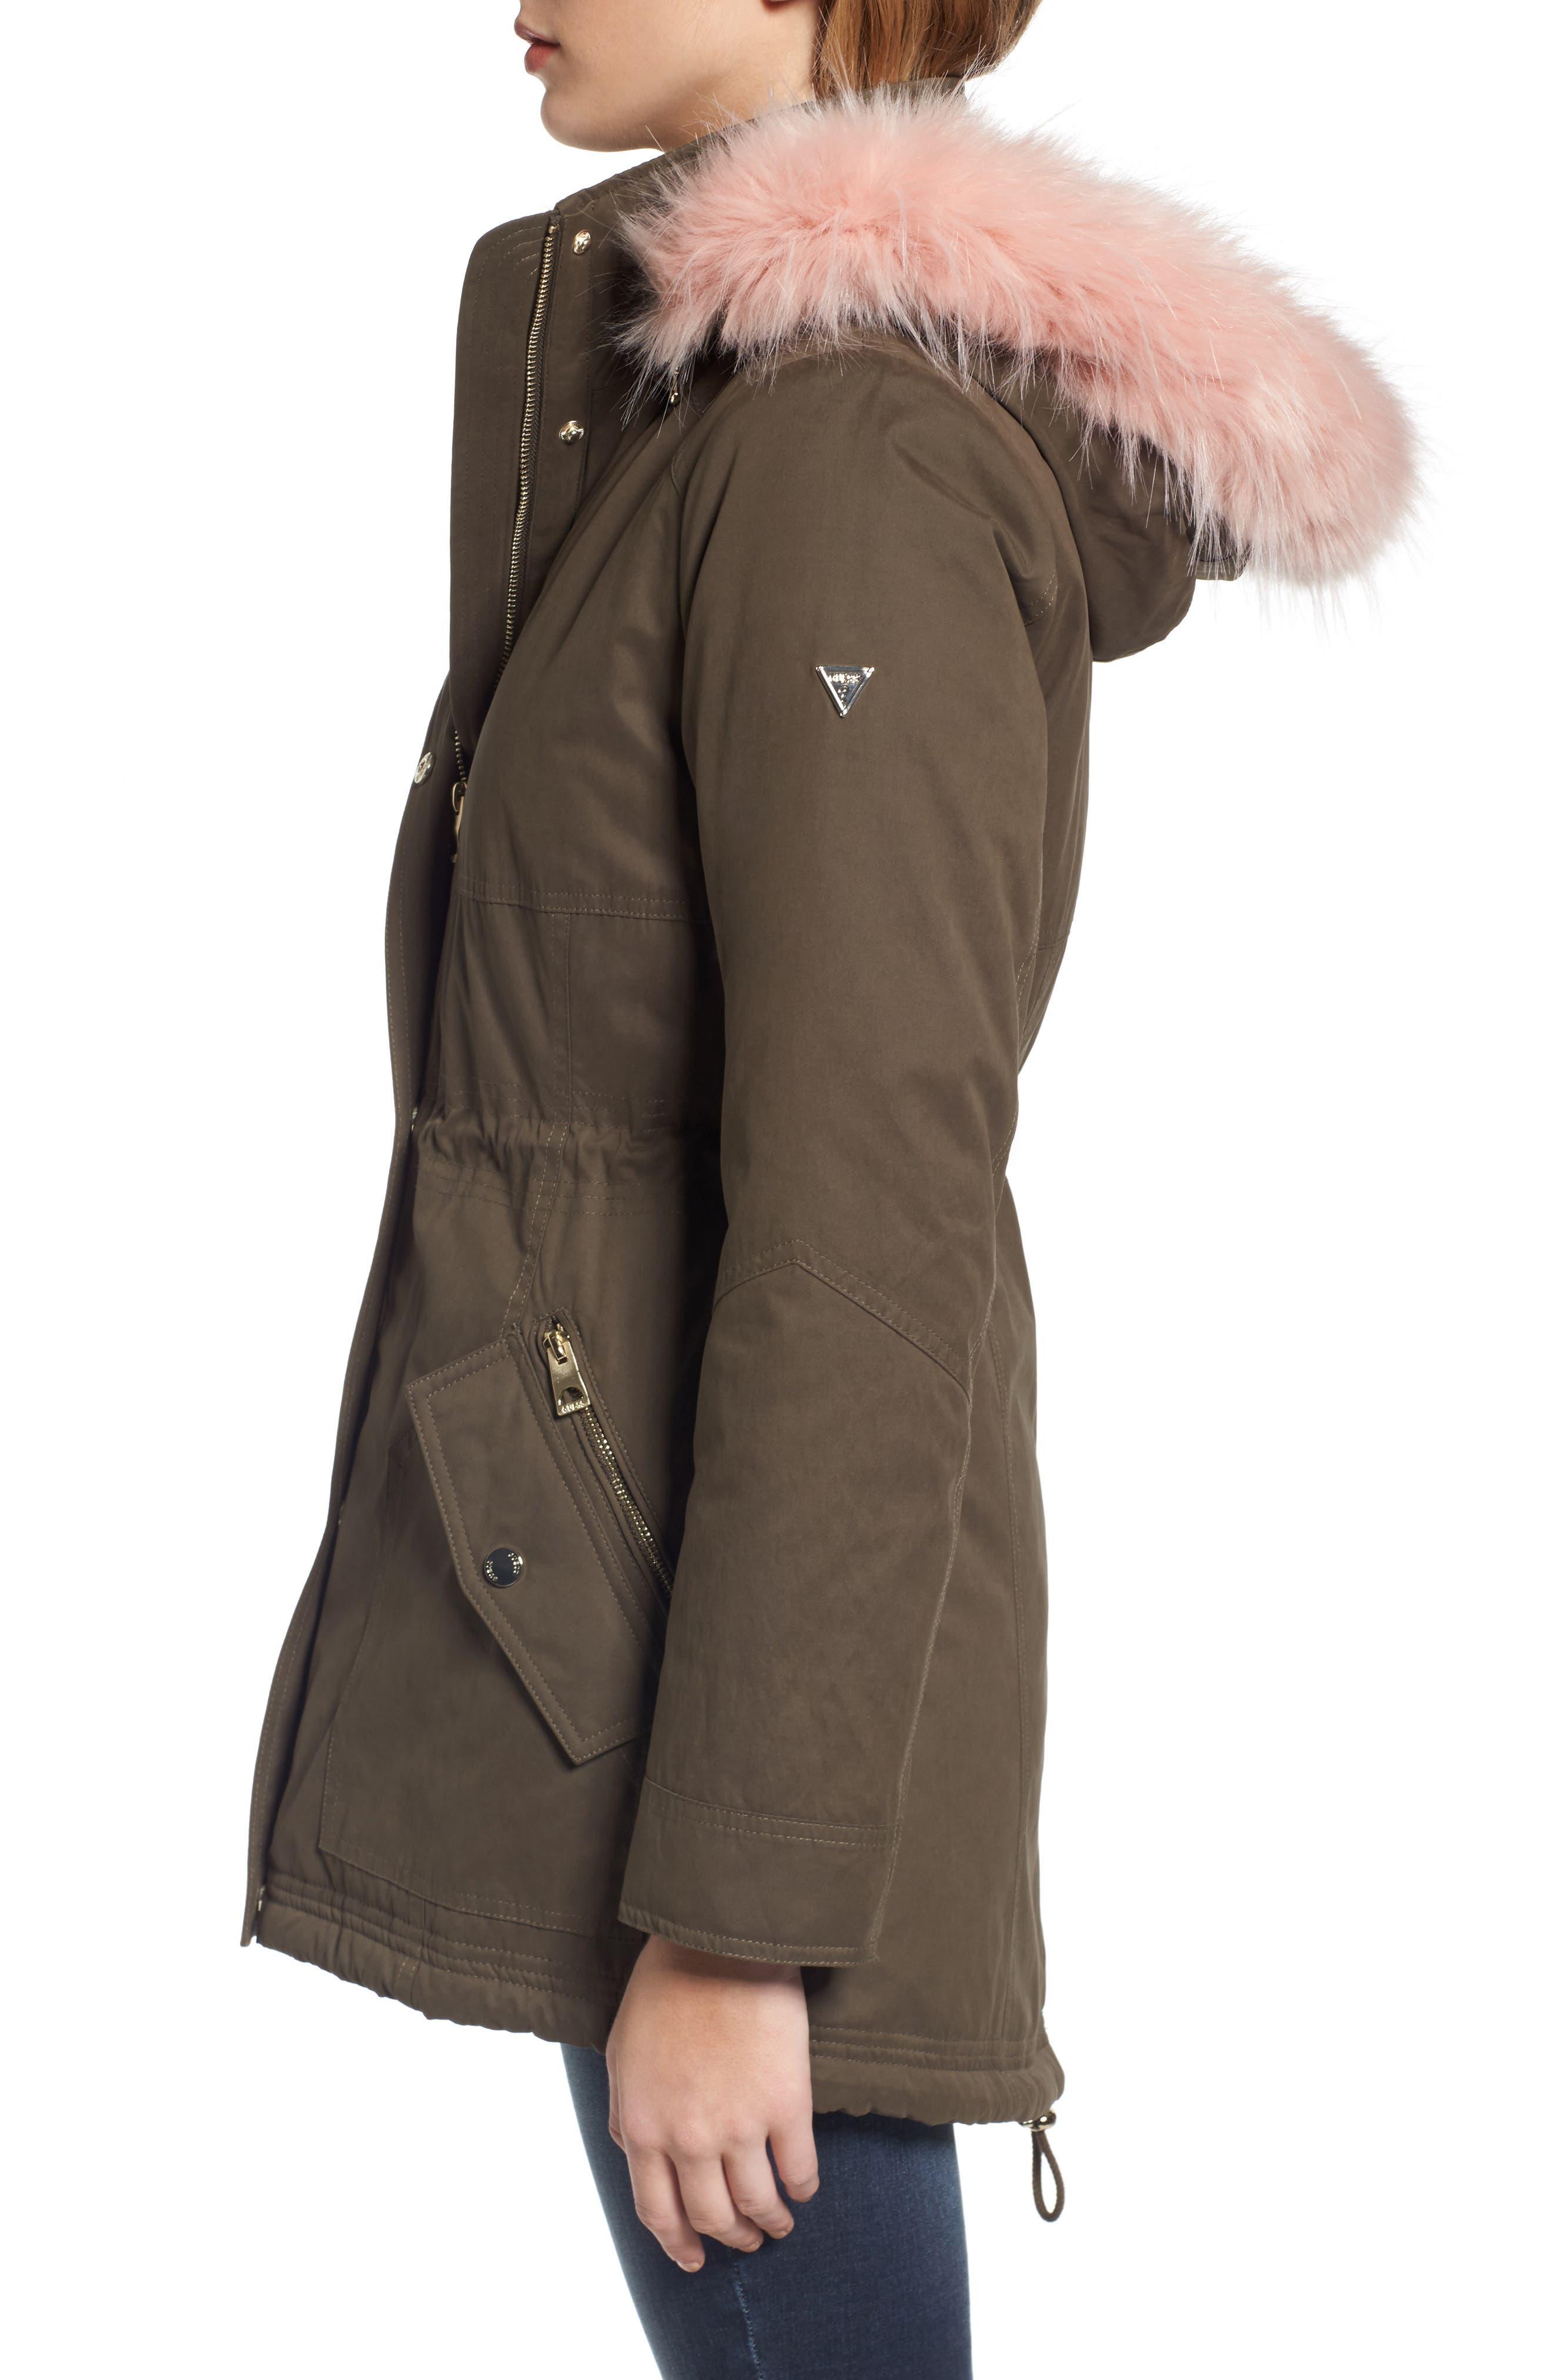 Parka with Removable Faux Fur Trim Hood,                             Alternate thumbnail 3, color,                             Olive/ Pink Fur